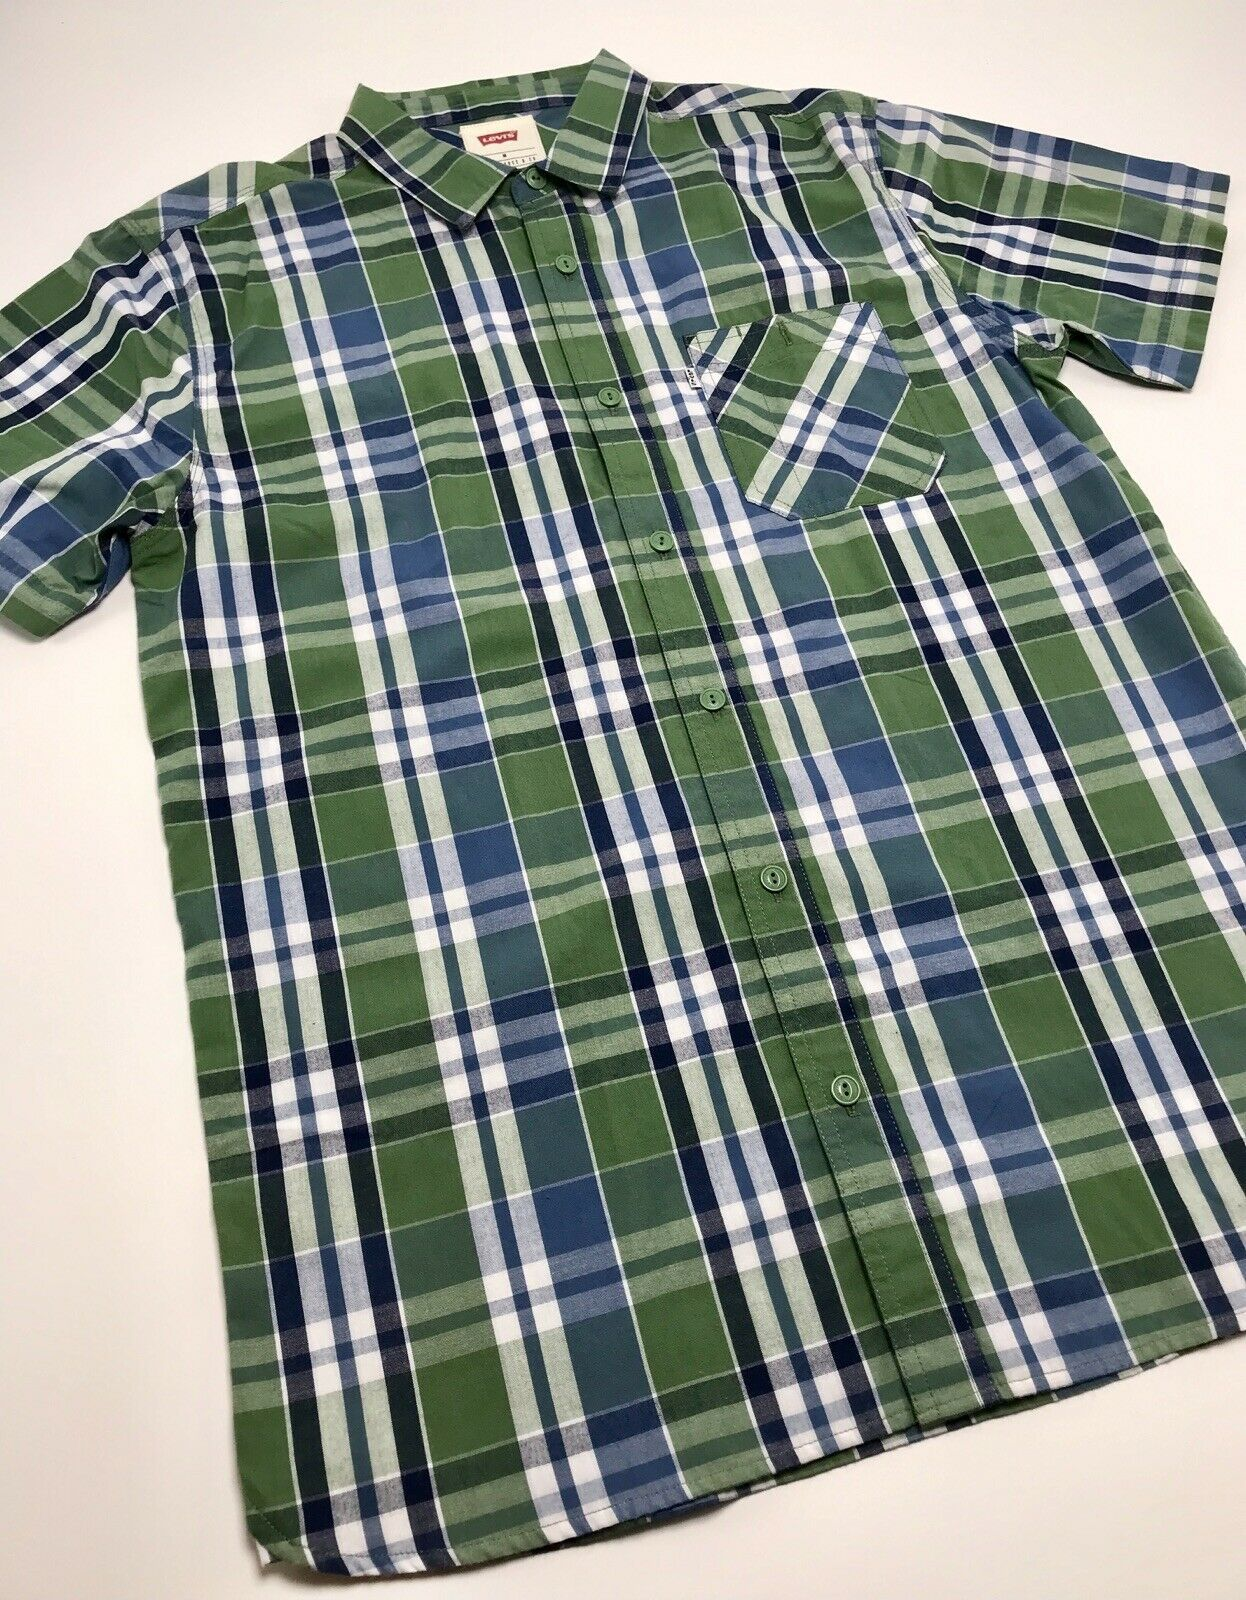 Men's Levi's Green | Blue | White Plaid S/S Button Down Shirt - $69.00